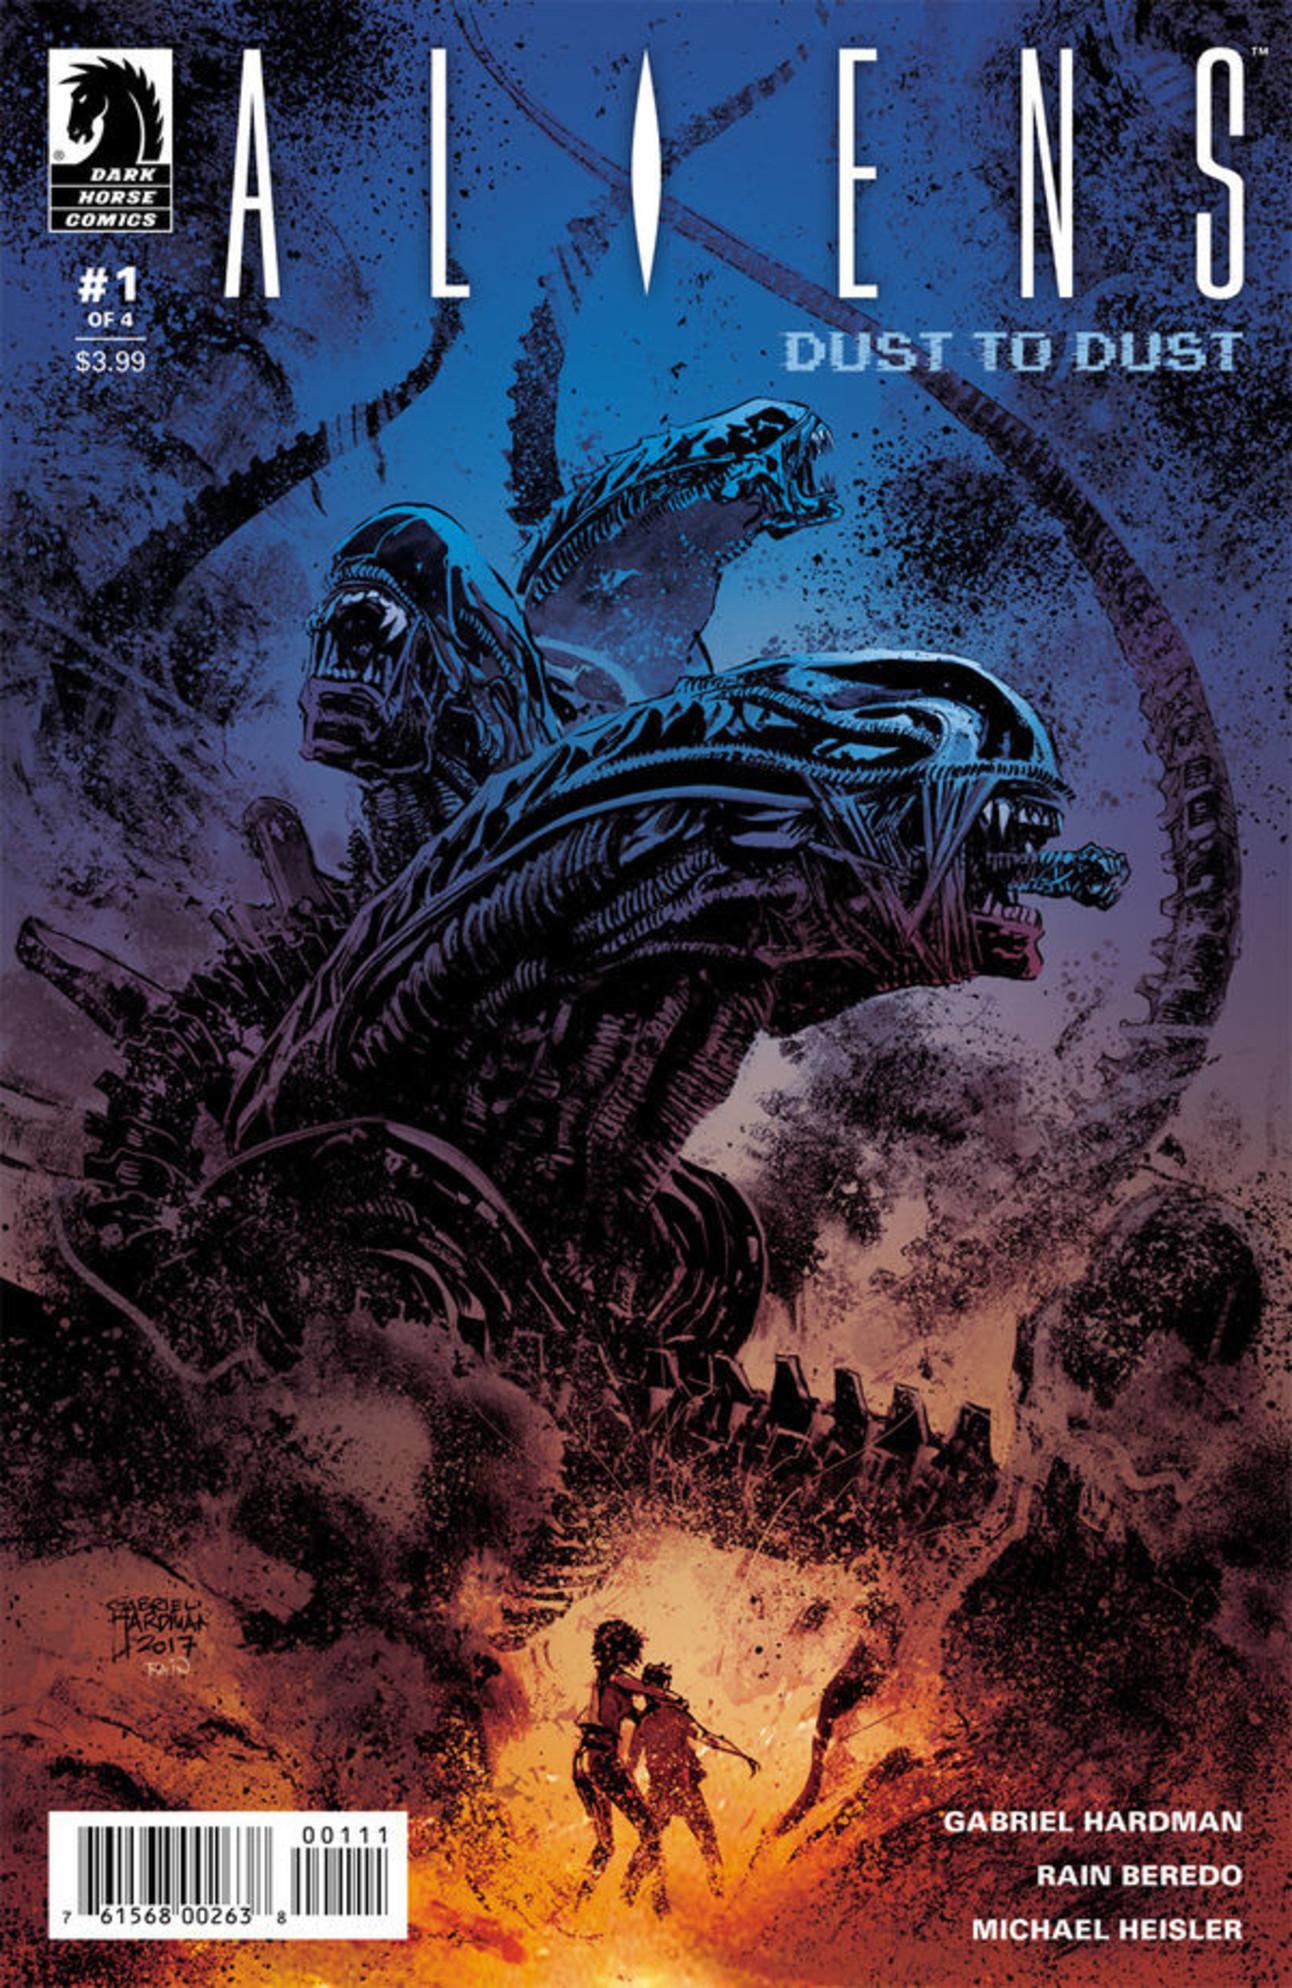 darkhorse_aliens_dust_to_dust.jpg